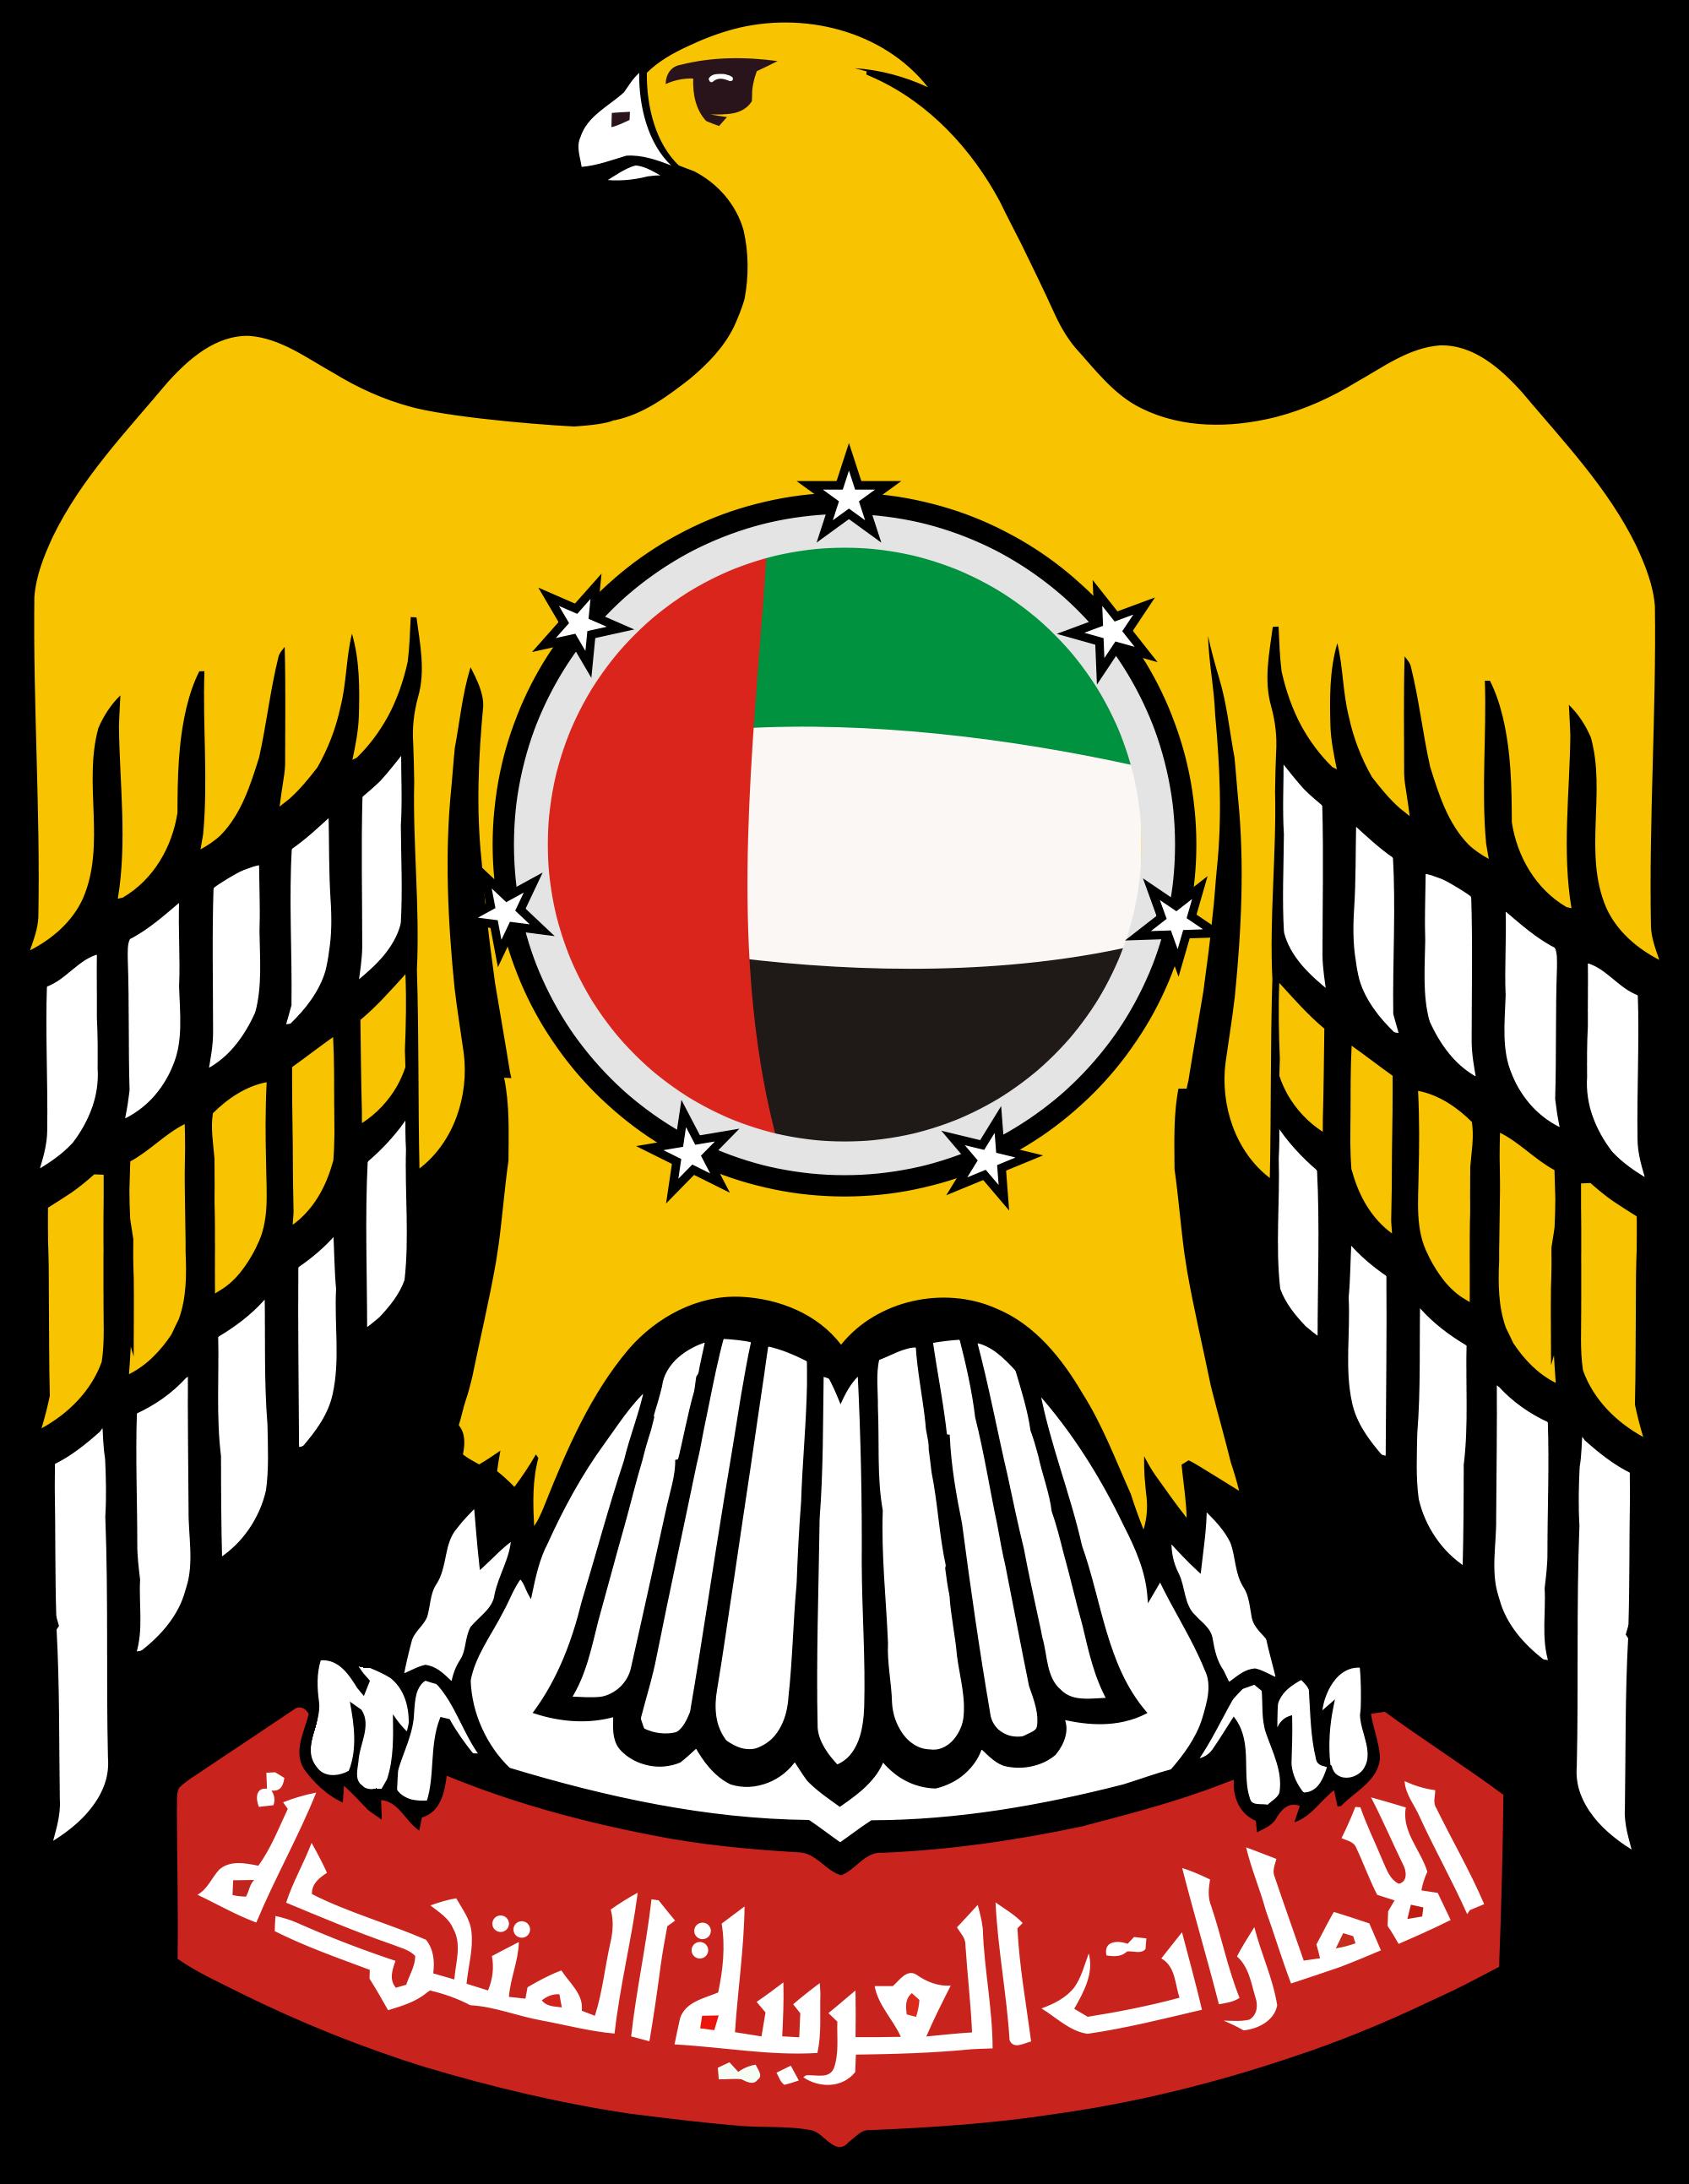 Исмаил Шангареев - герб ОАЭ